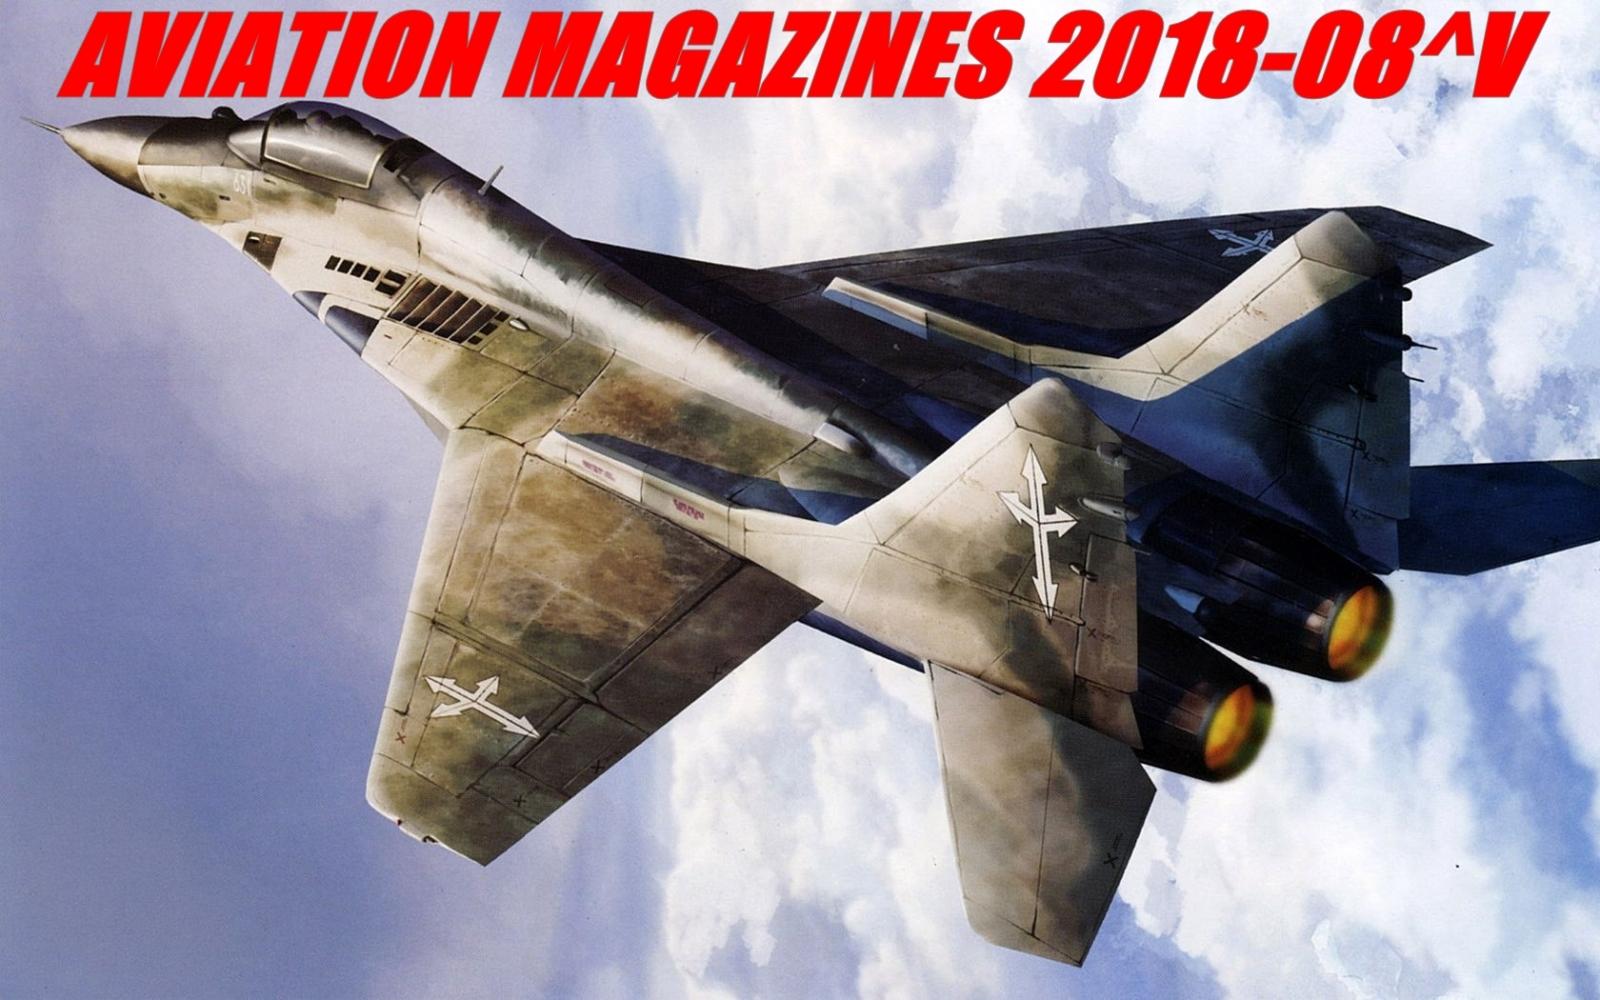 Aviation magazines 2018-08